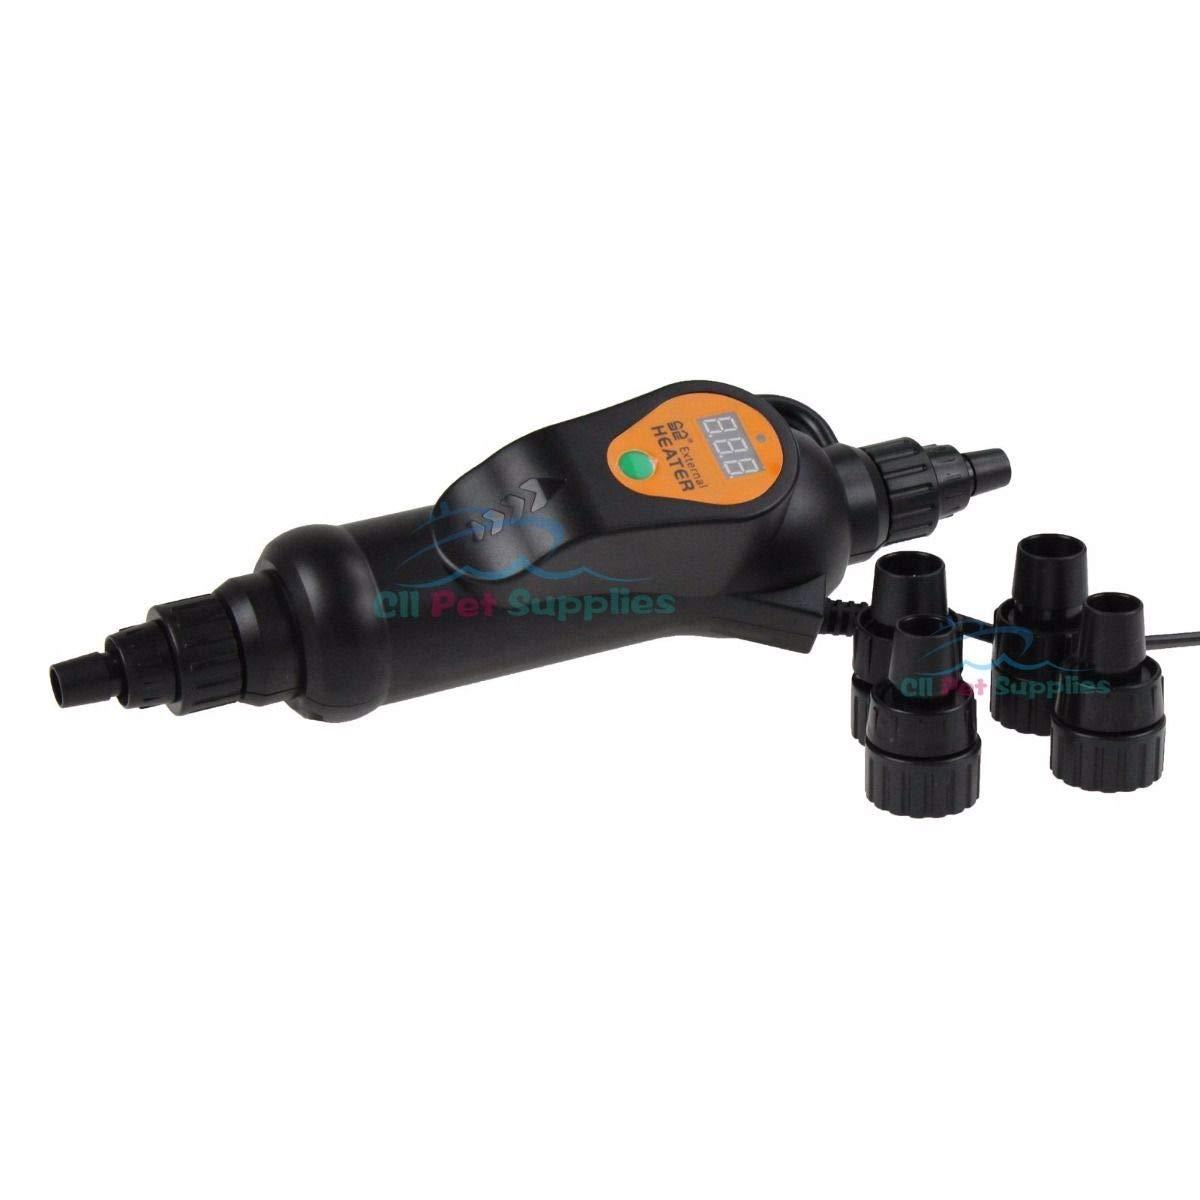 Aquarium 200W/300W Adjustable External Inline Heater Fish Tank Canister Filter